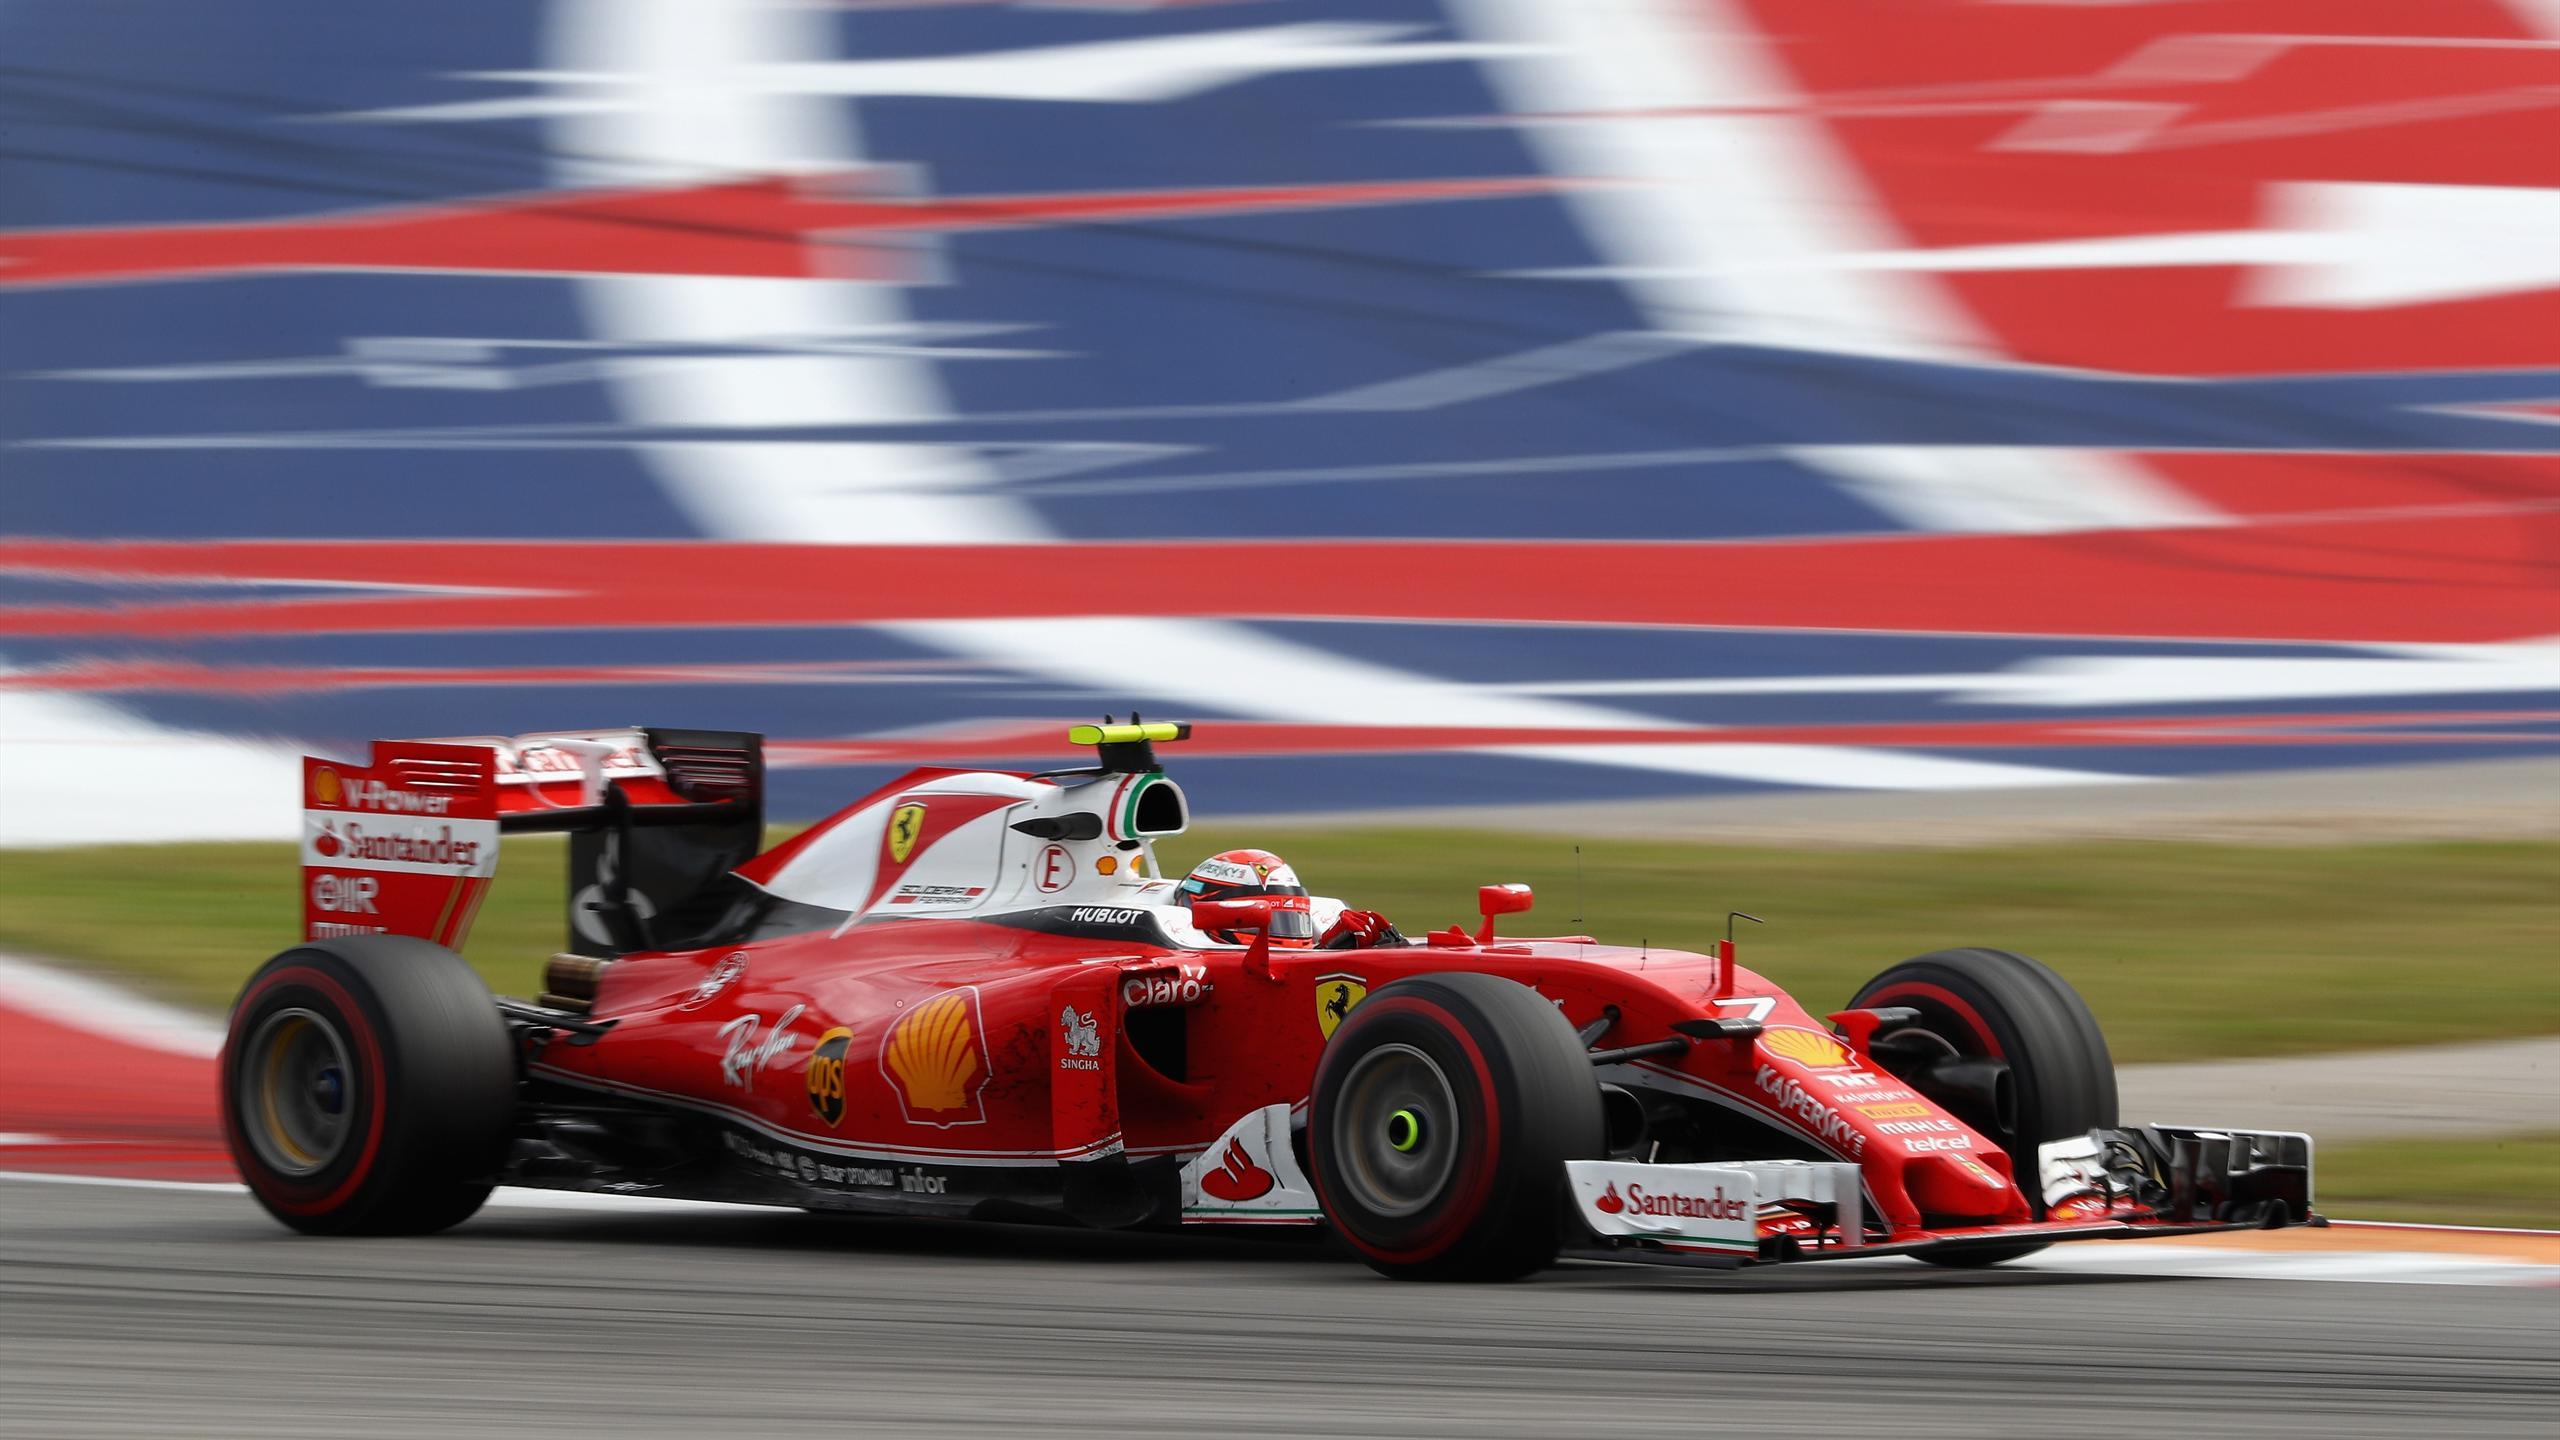 Kimi Räikkönen (Ferrari) - GP of United States of America 2016